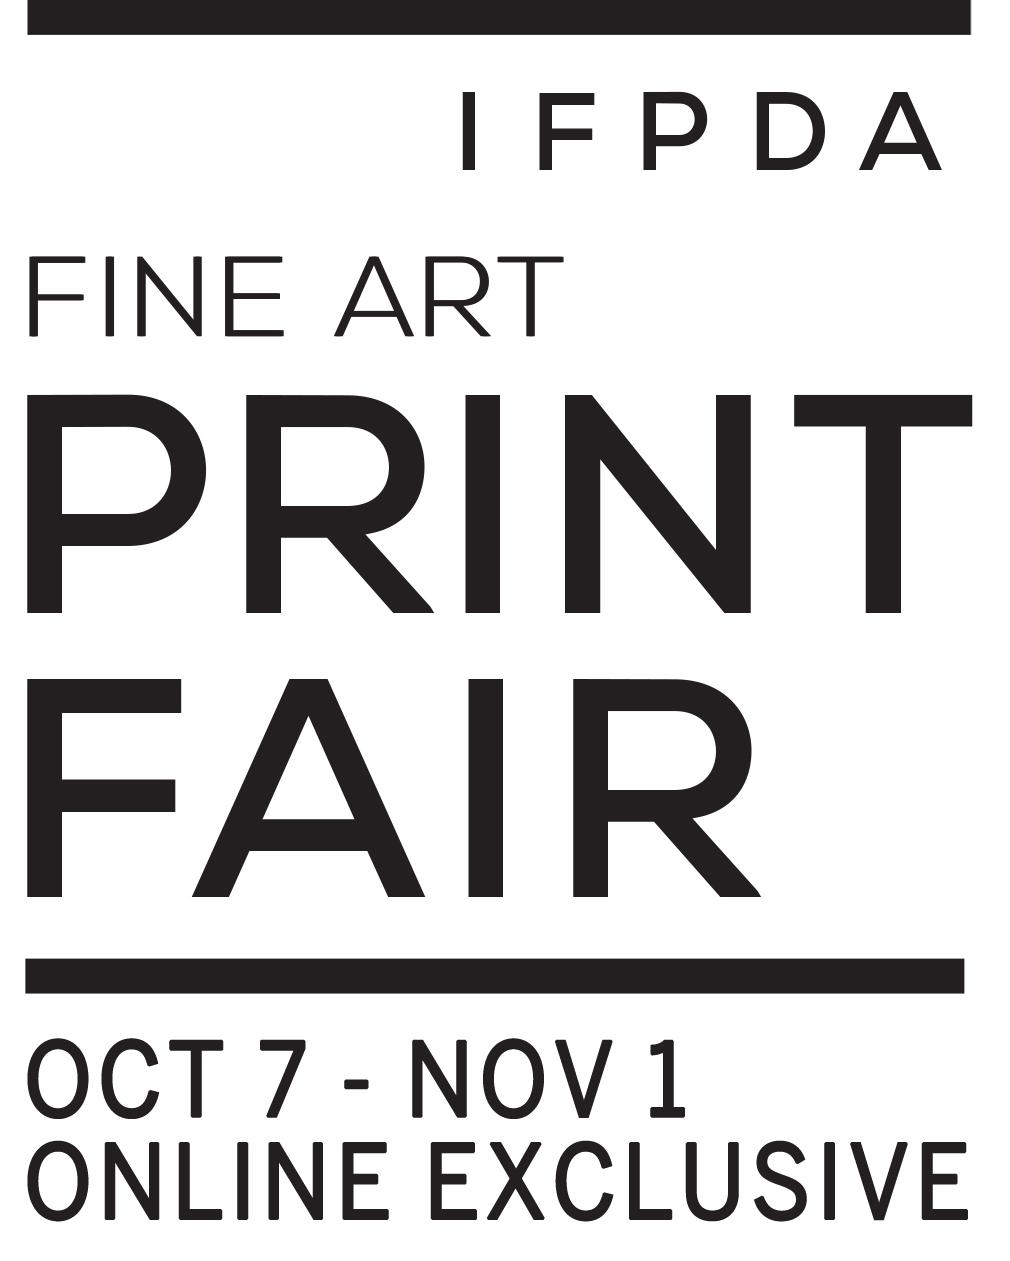 IFPDA Fine Art Print Fair Banner